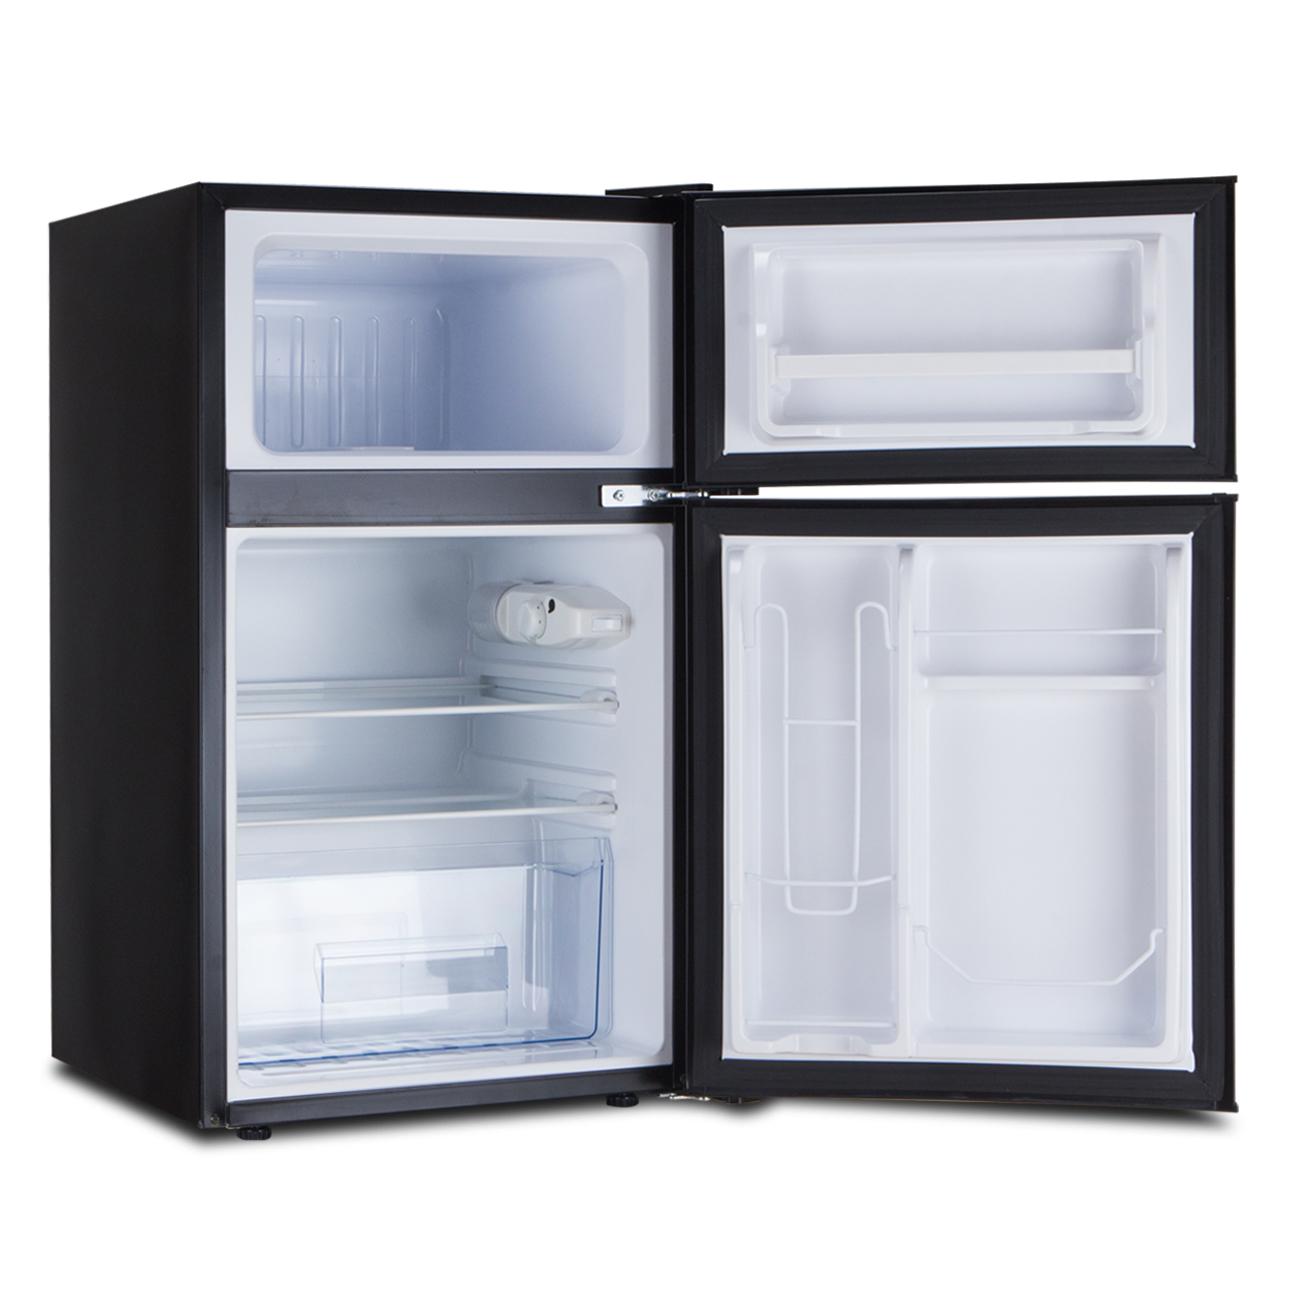 Mini All Food Refrigerator Black 2 Door Full Freezer